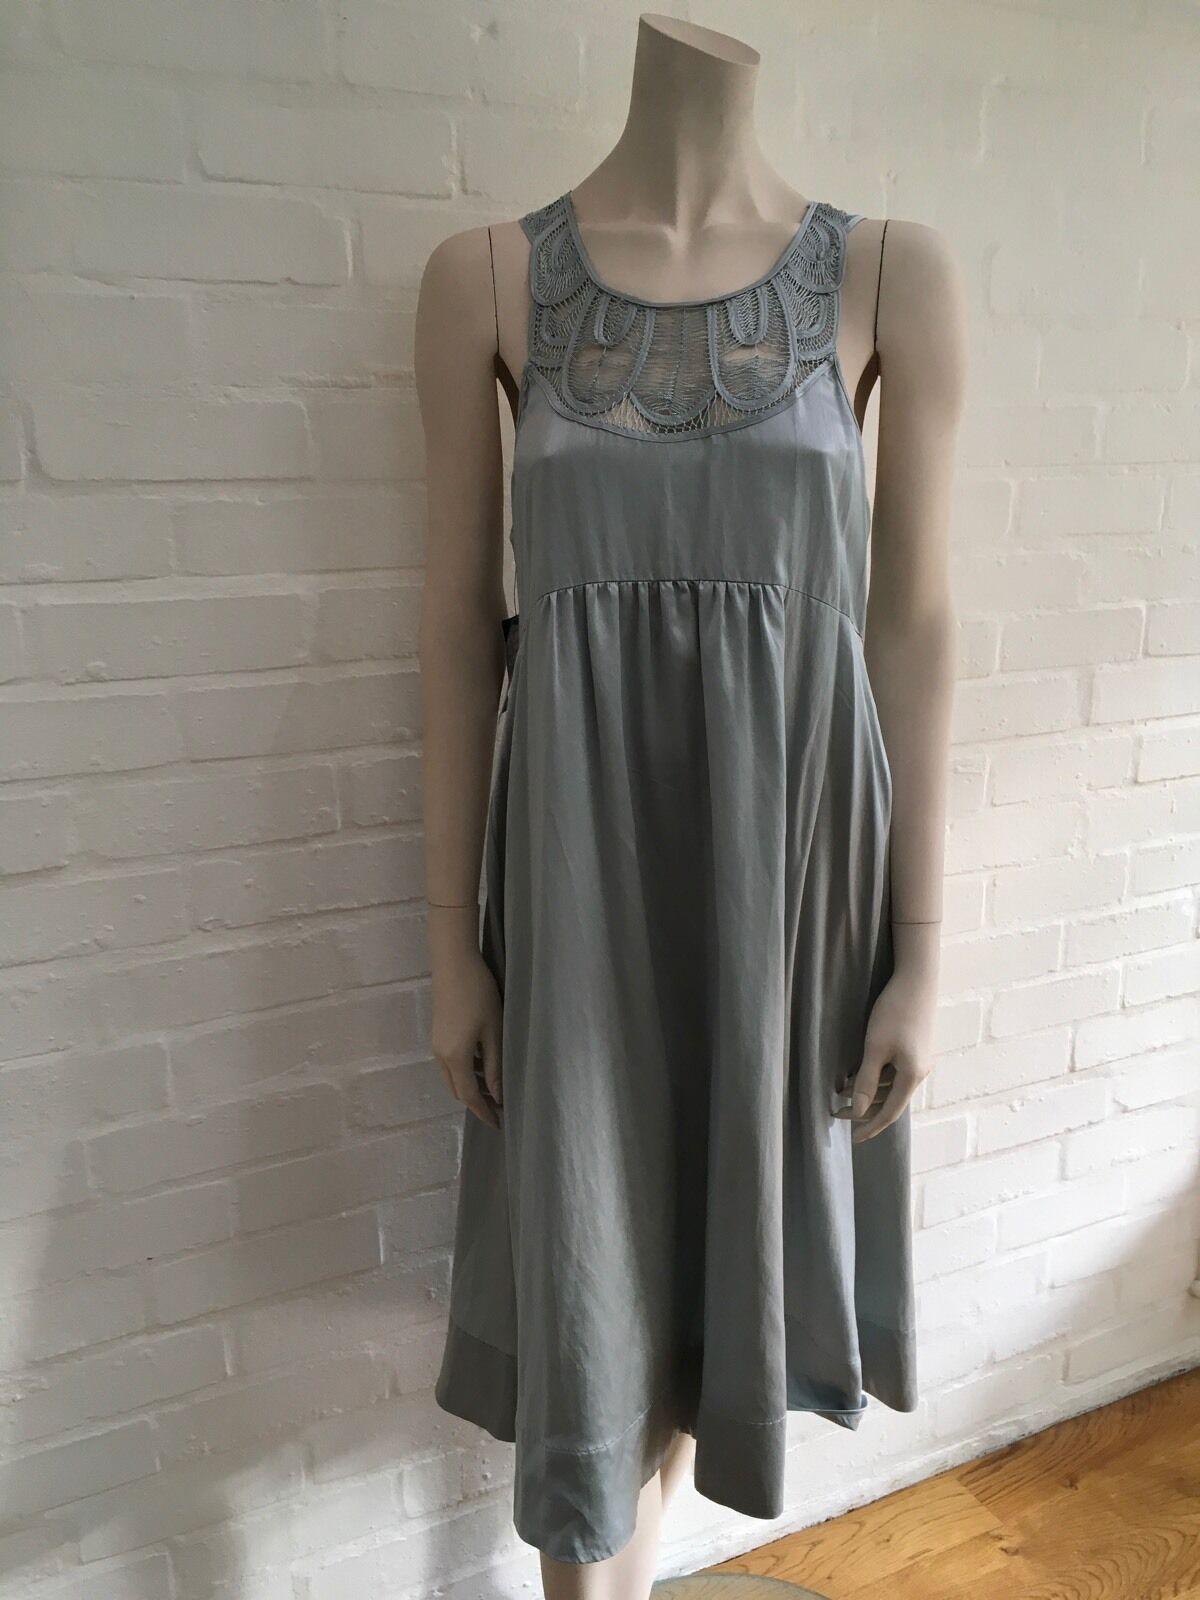 DAY Birger et Mikkelsen, Movie Silk Dress Size Size Size DK 40 US 10 L LARGE f6189b